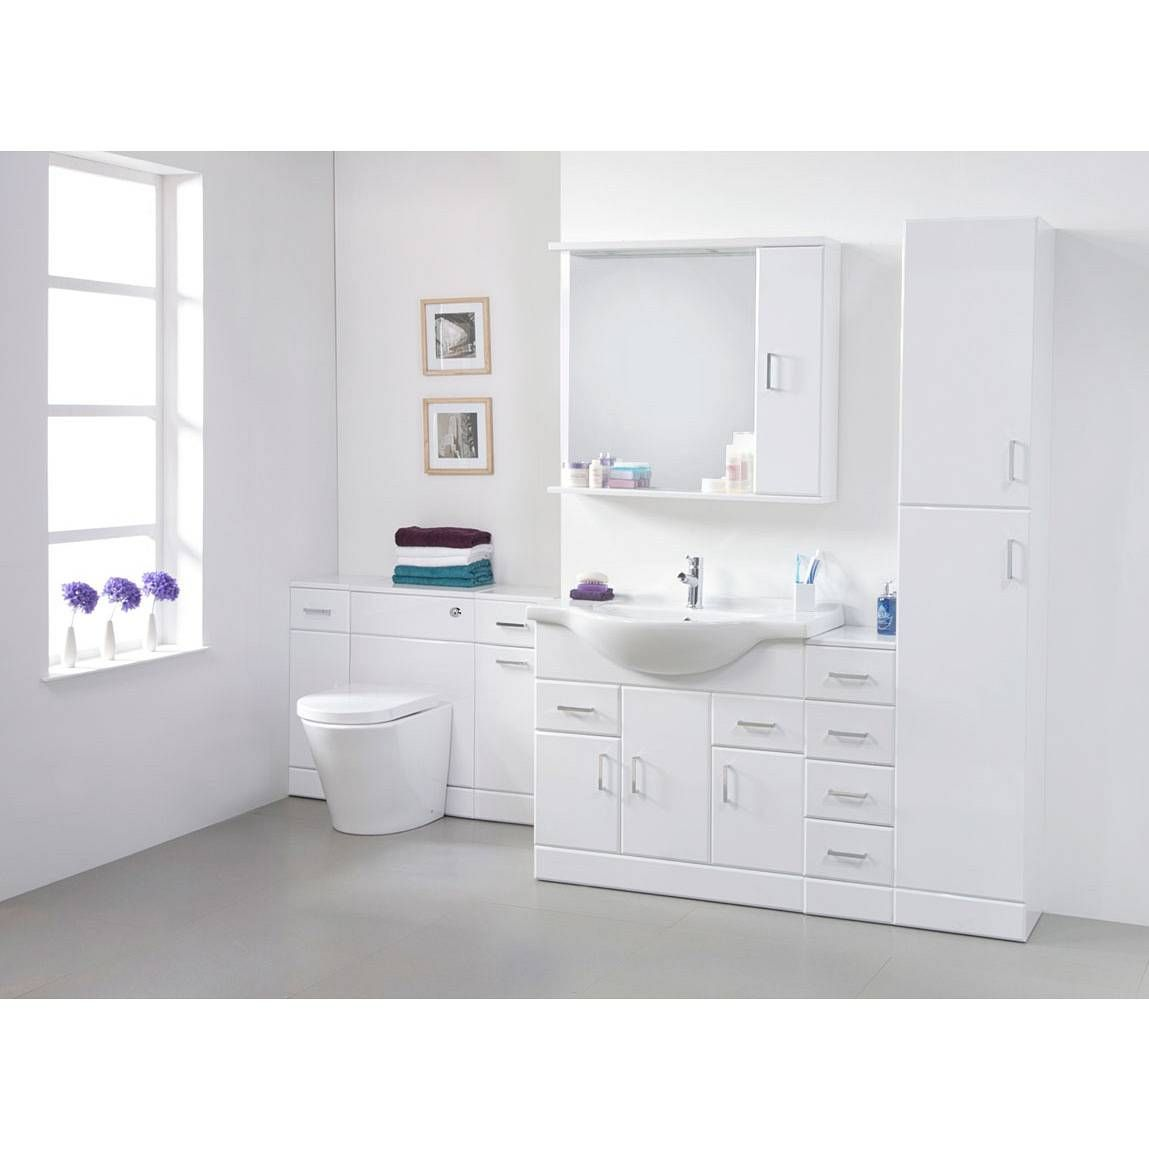 Sienna 85 Vanity Unit & Basin | Bathroom ideas | Pinterest | Basin ...